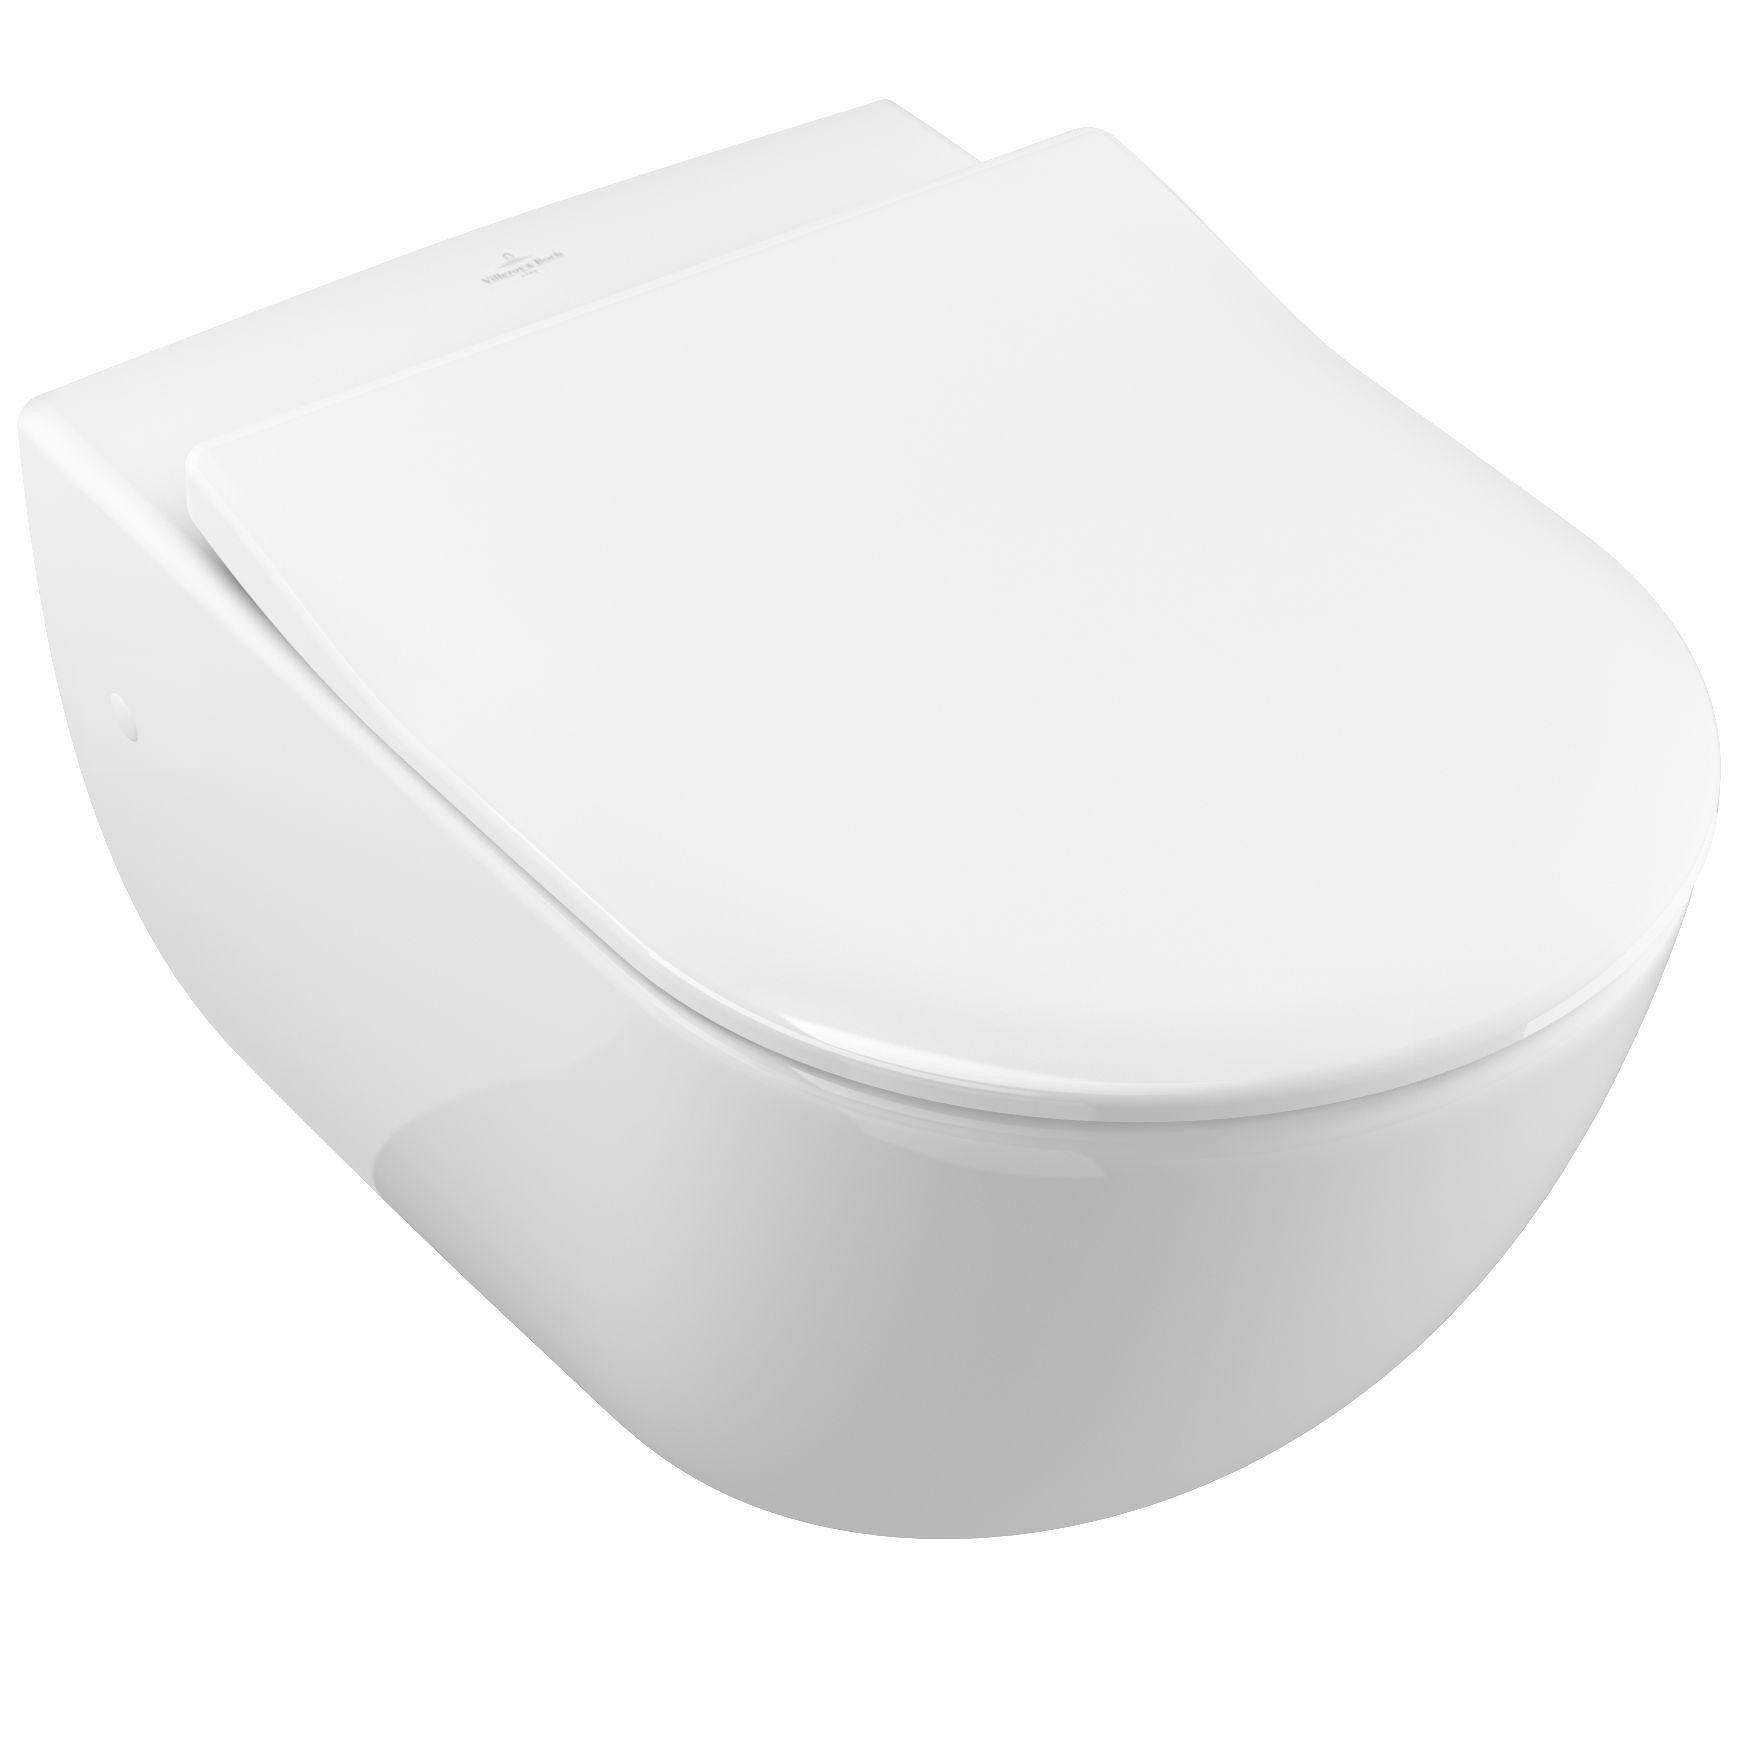 Villeroy & Boch Subway Tiefspül-Wand-WC L:56,5xB:37,5cm Star White mit Ceramicplus 660010R2